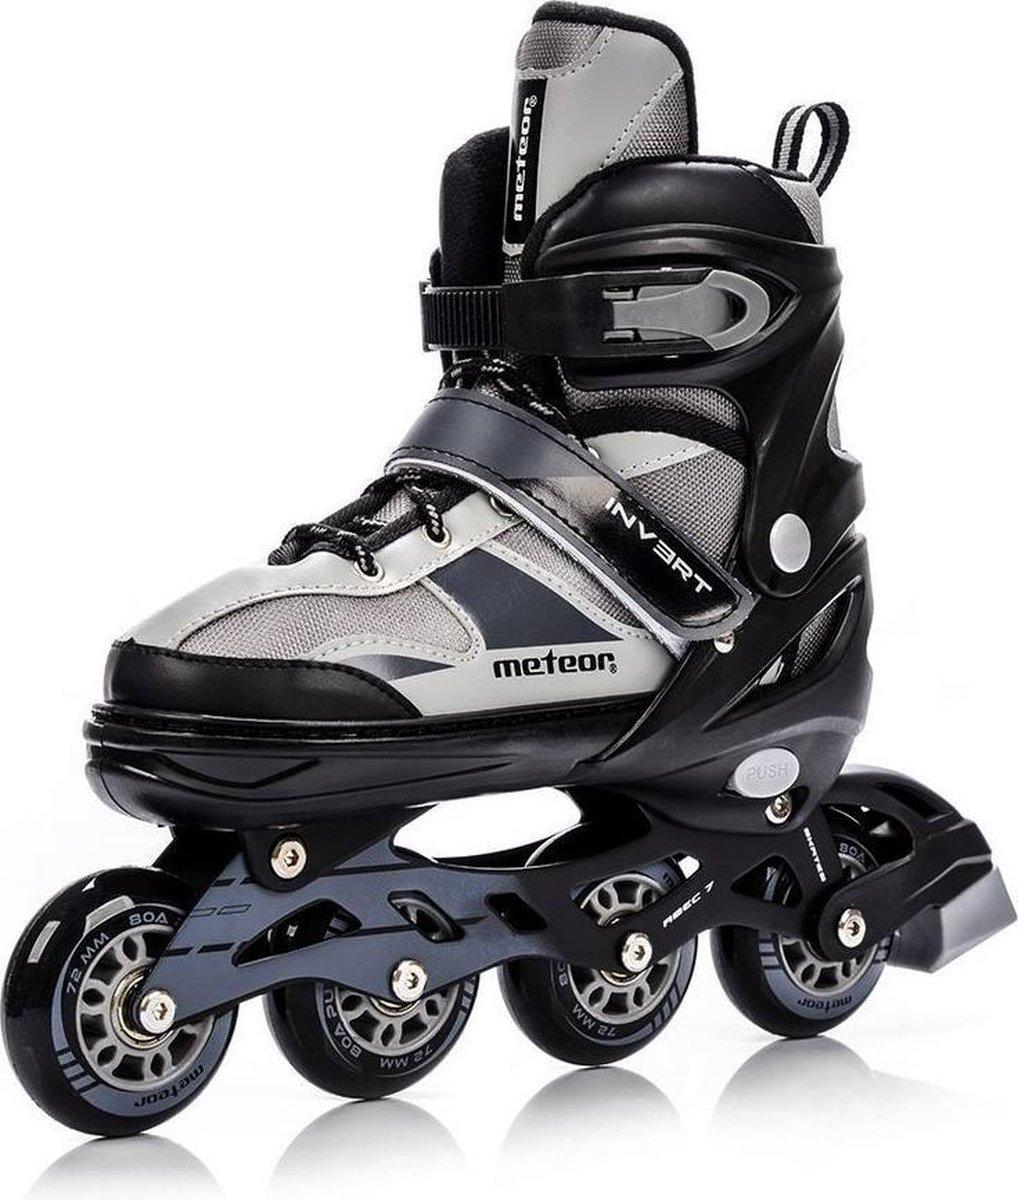 Meteor * skeelers * inline skates * kleur/zwart/grijs* maat 34-37 verstelbaar*